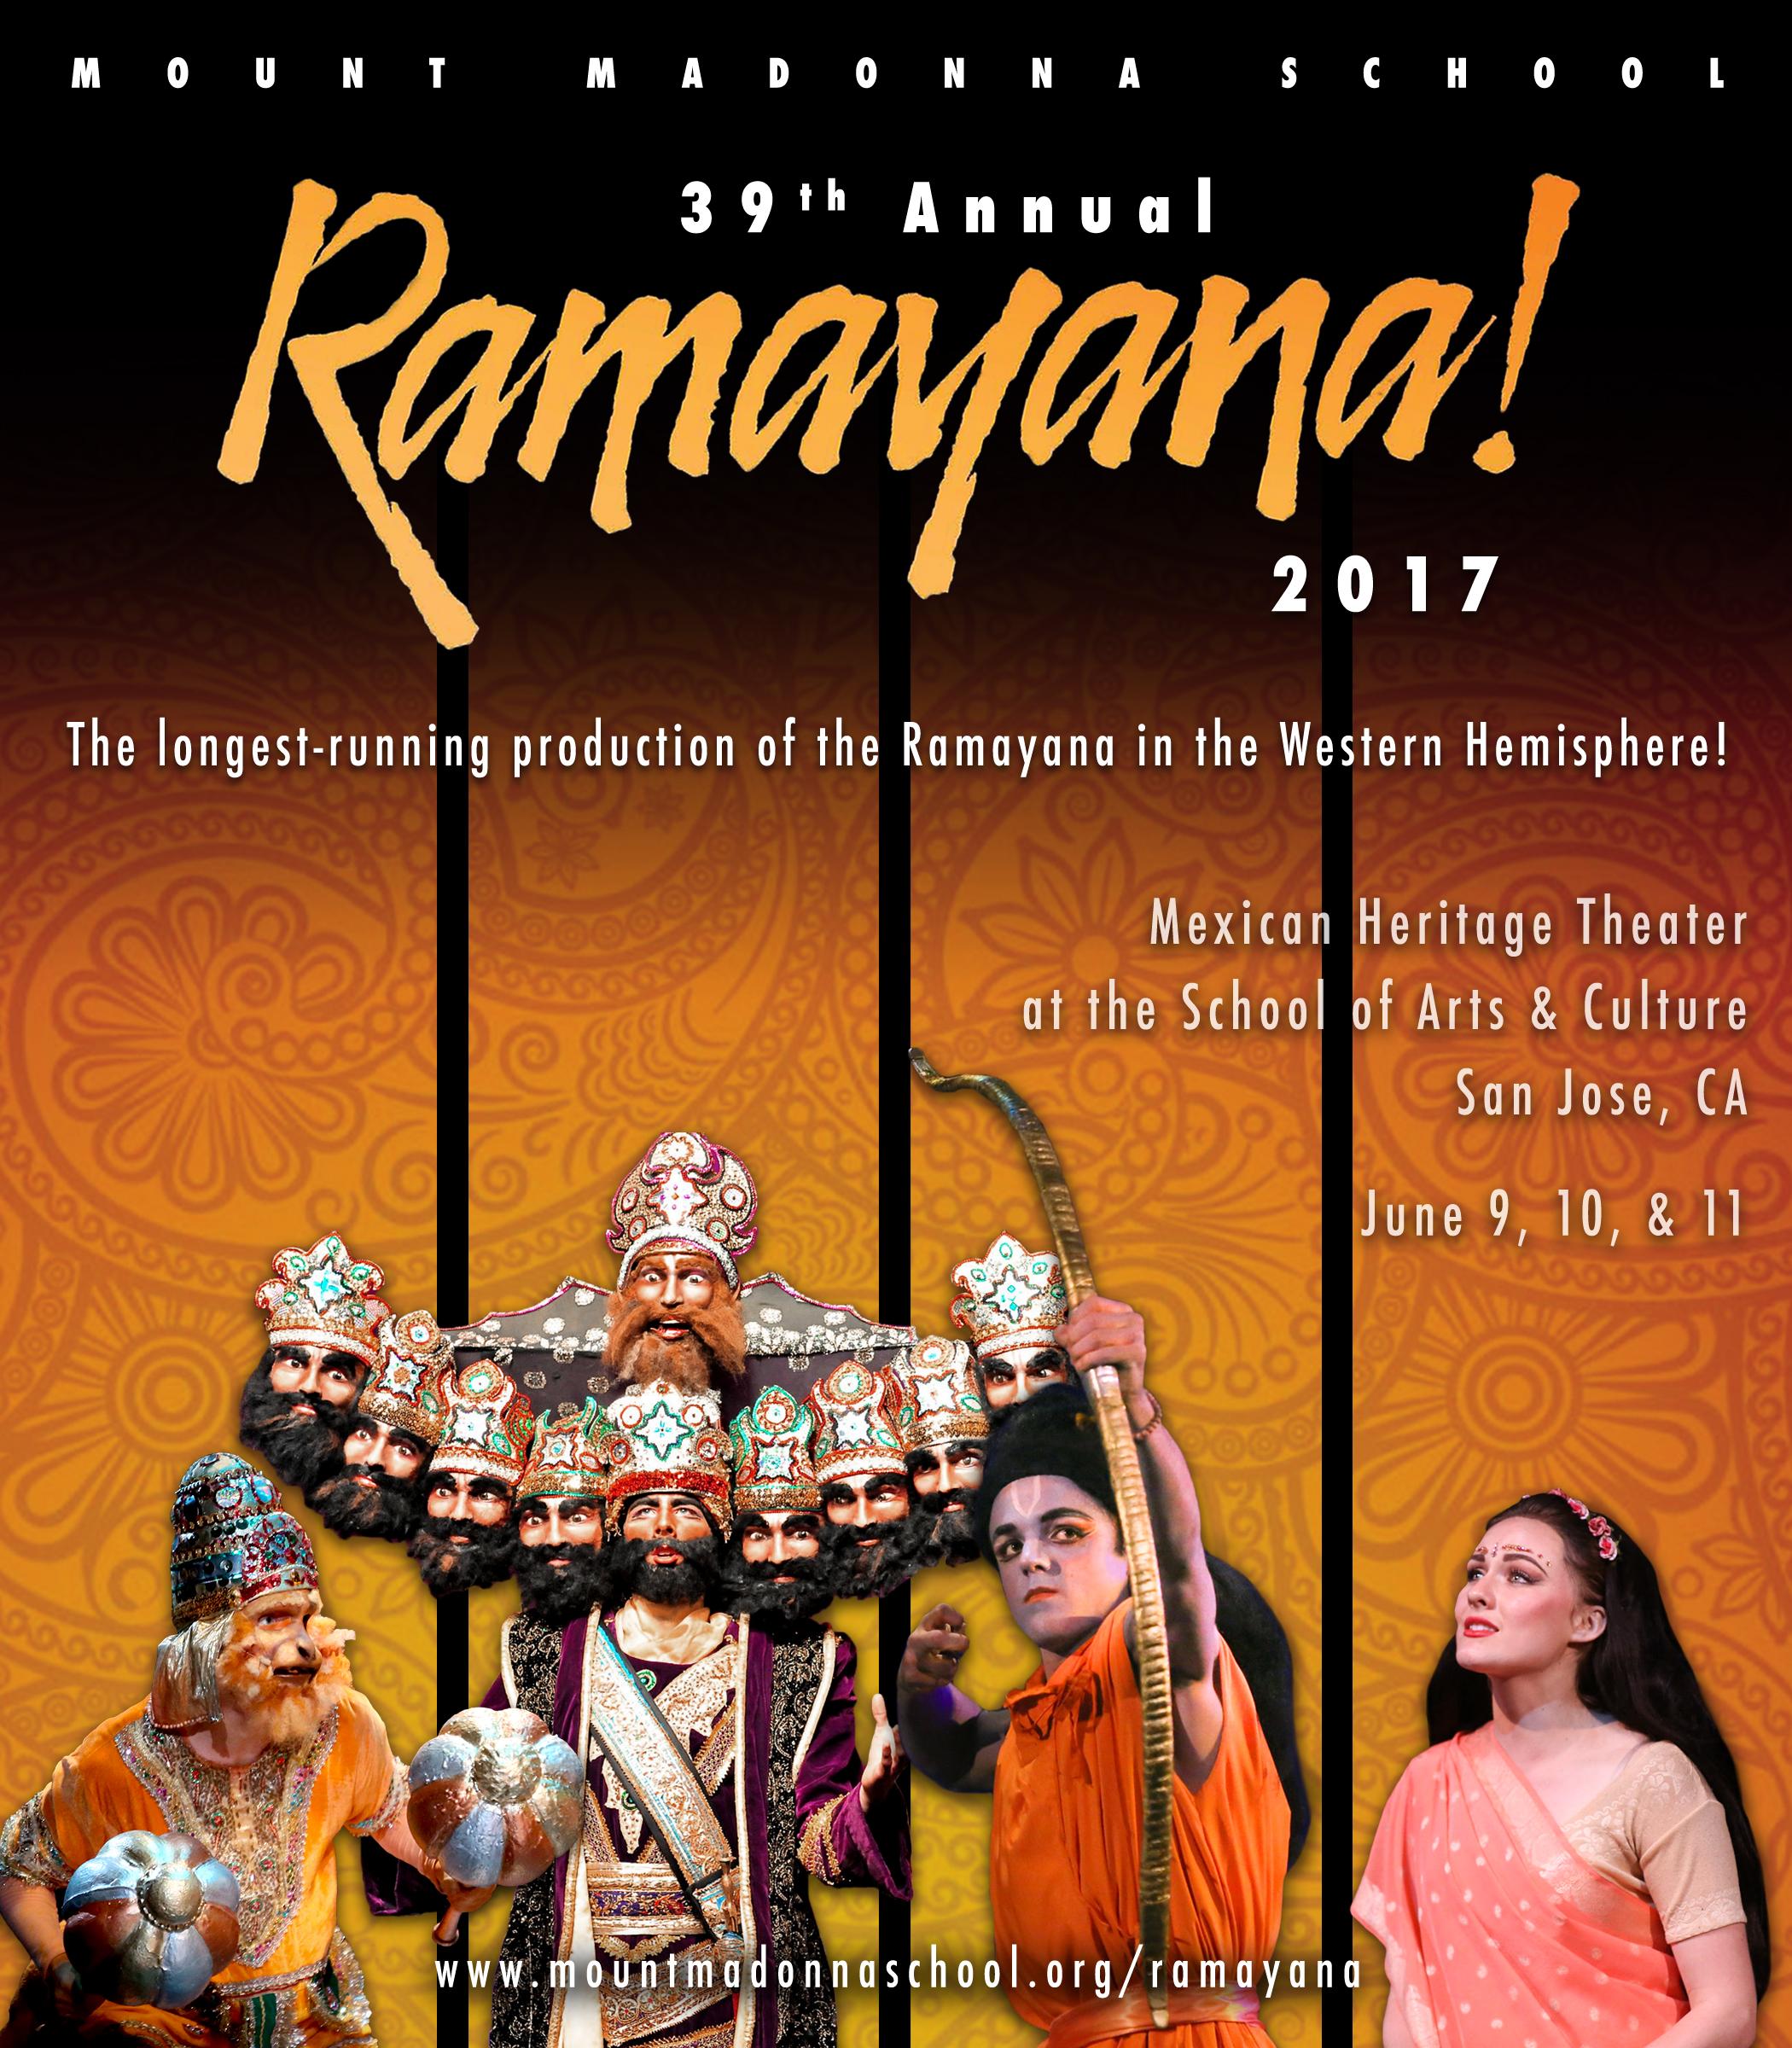 2017 <i>Ramayana!</i> Video Recording